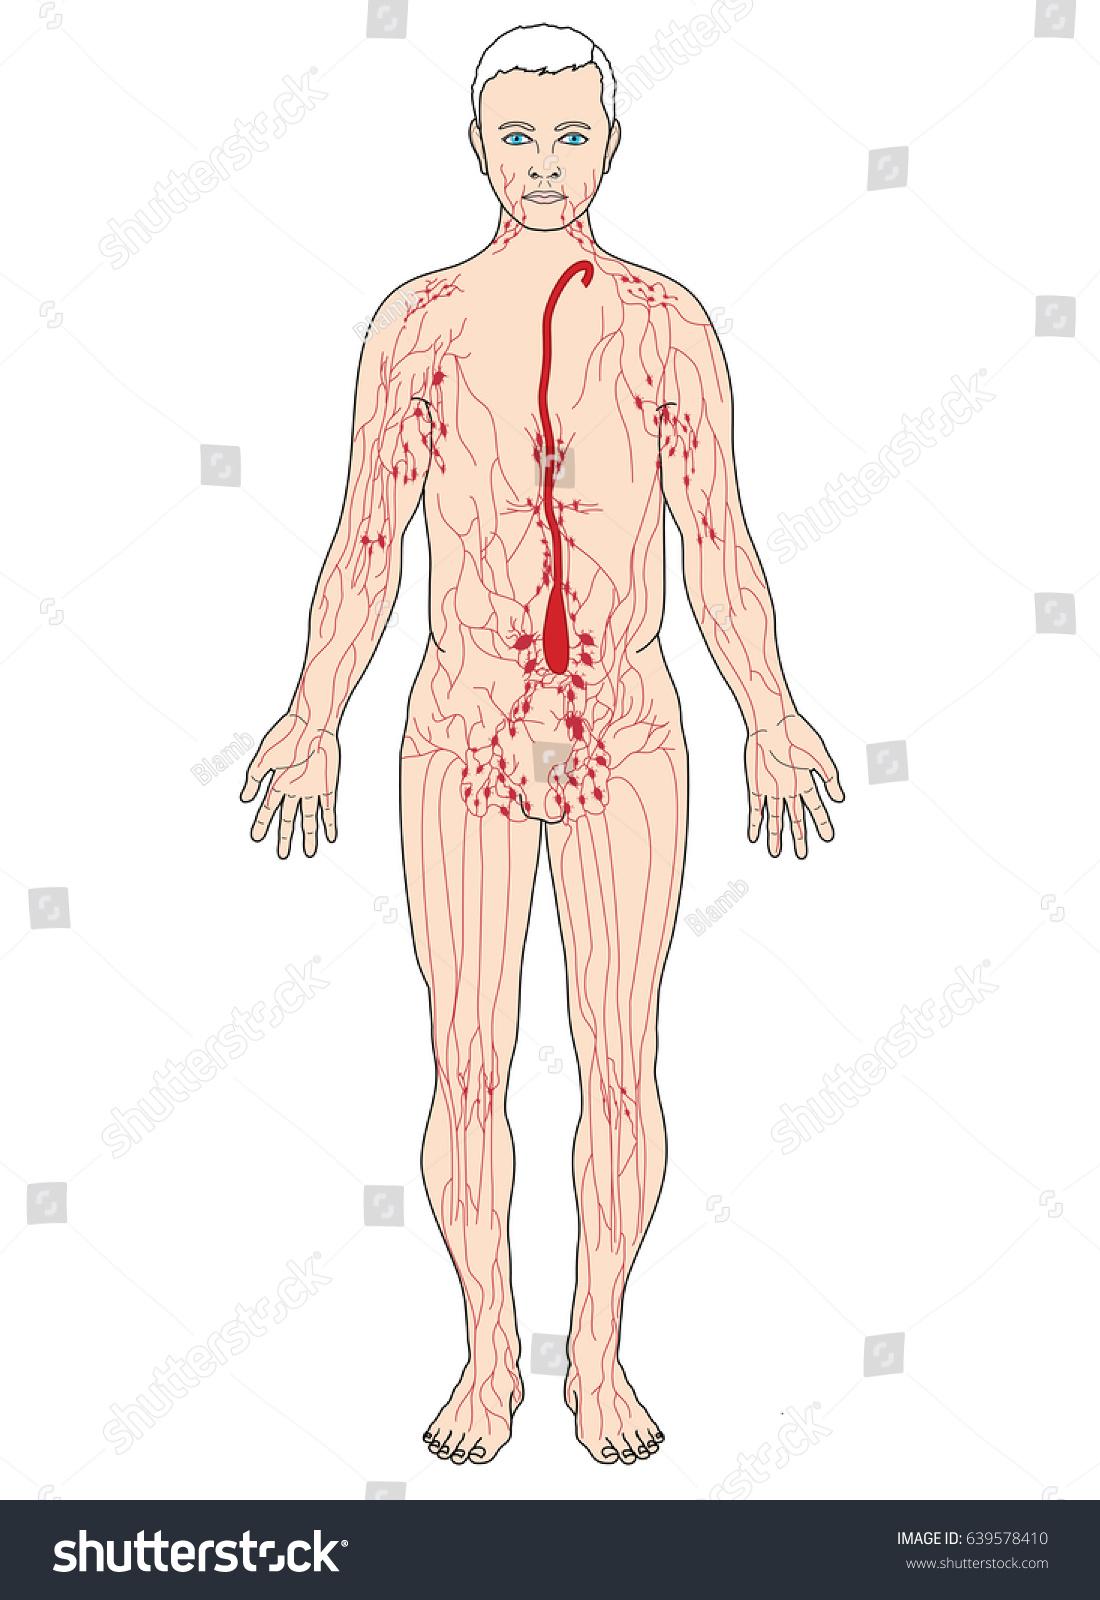 Main Lymph Nodes Lymph Vessels Including Stock Illustration ...